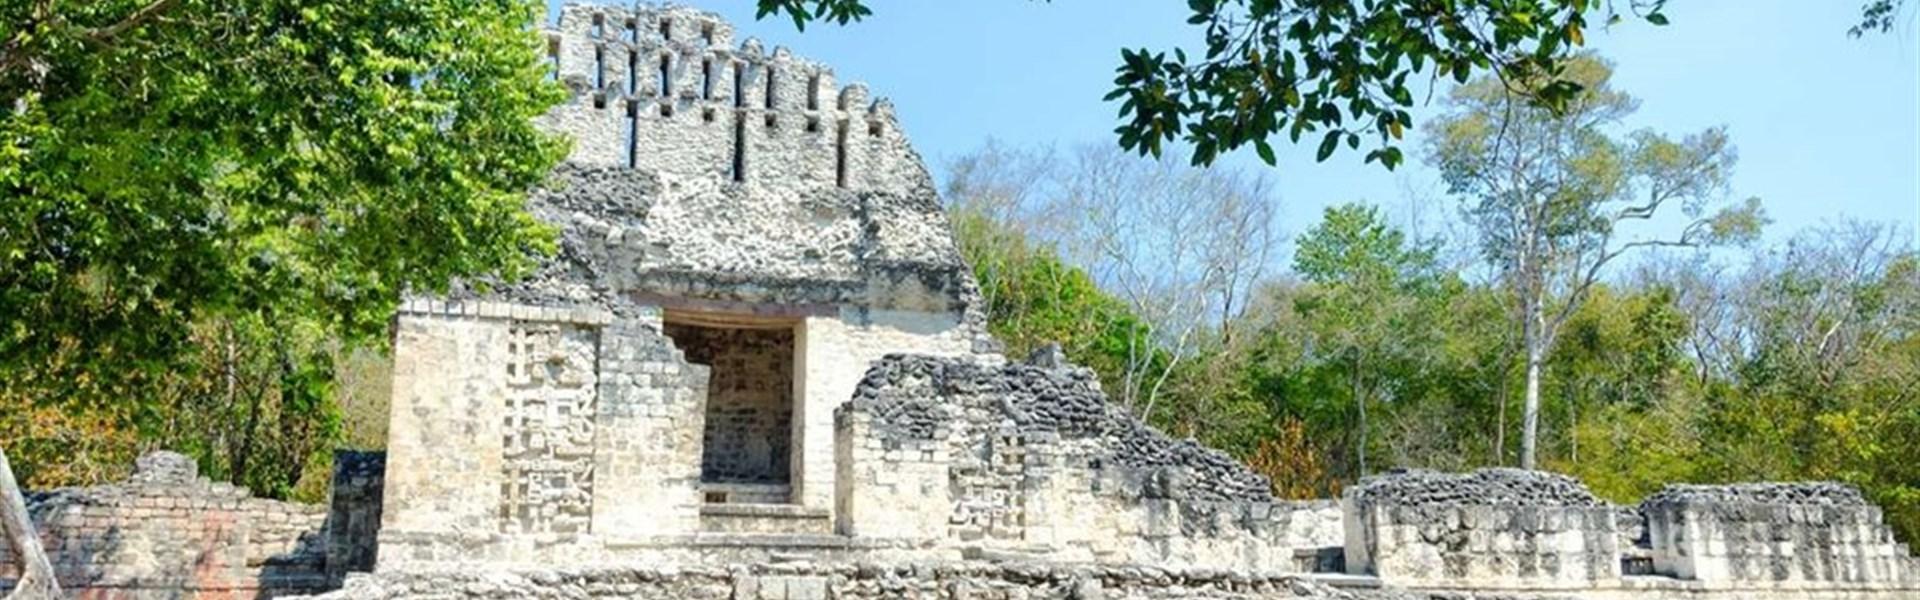 Krásy Yucatánu a Chiapasu s pobytem u Karibiku -